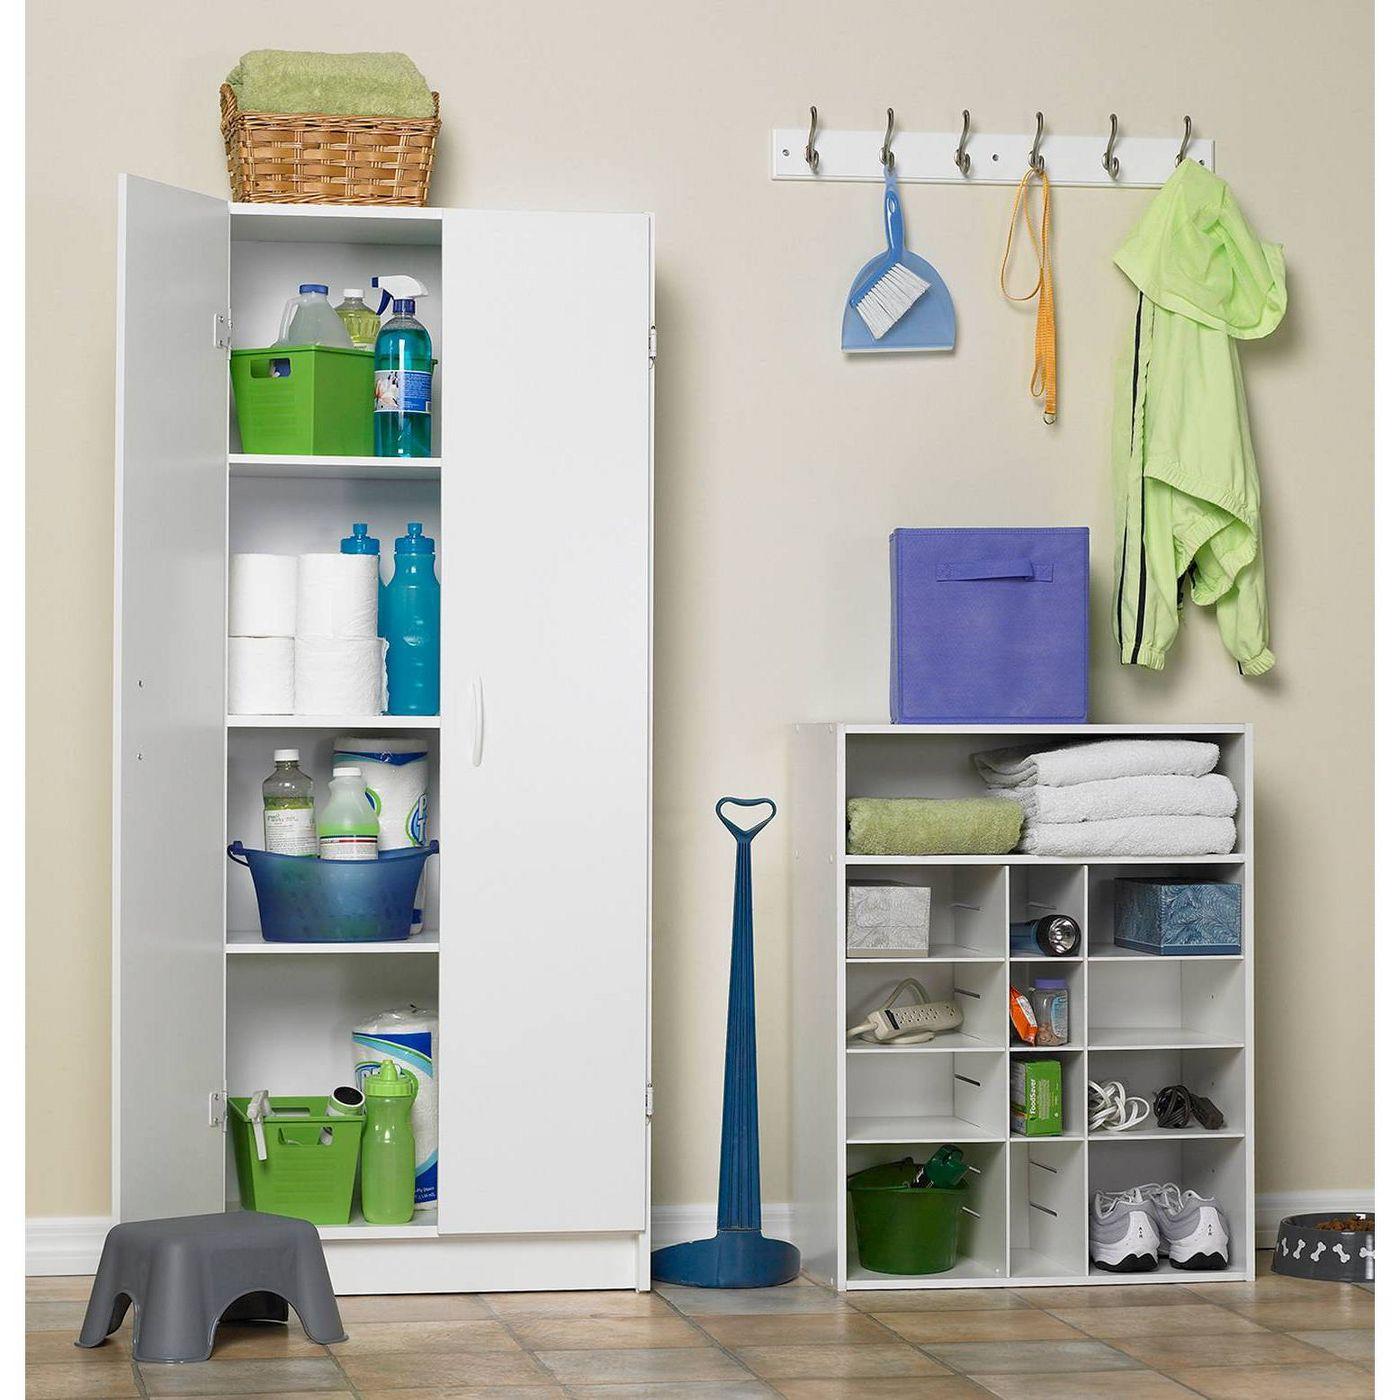 ClosetMaid White Kitchen Laundry Home Pantry Adjustable Shelves Cabinet